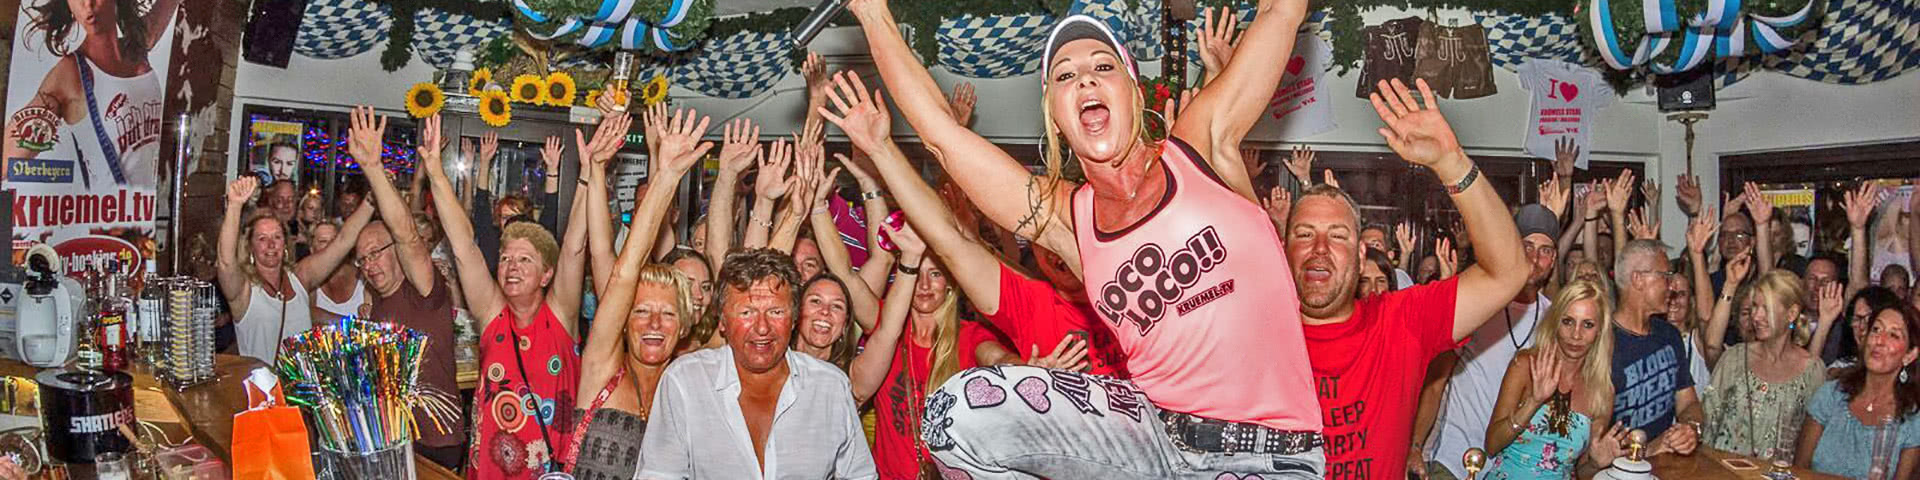 Party in Krümels Stadl auf Mallorca